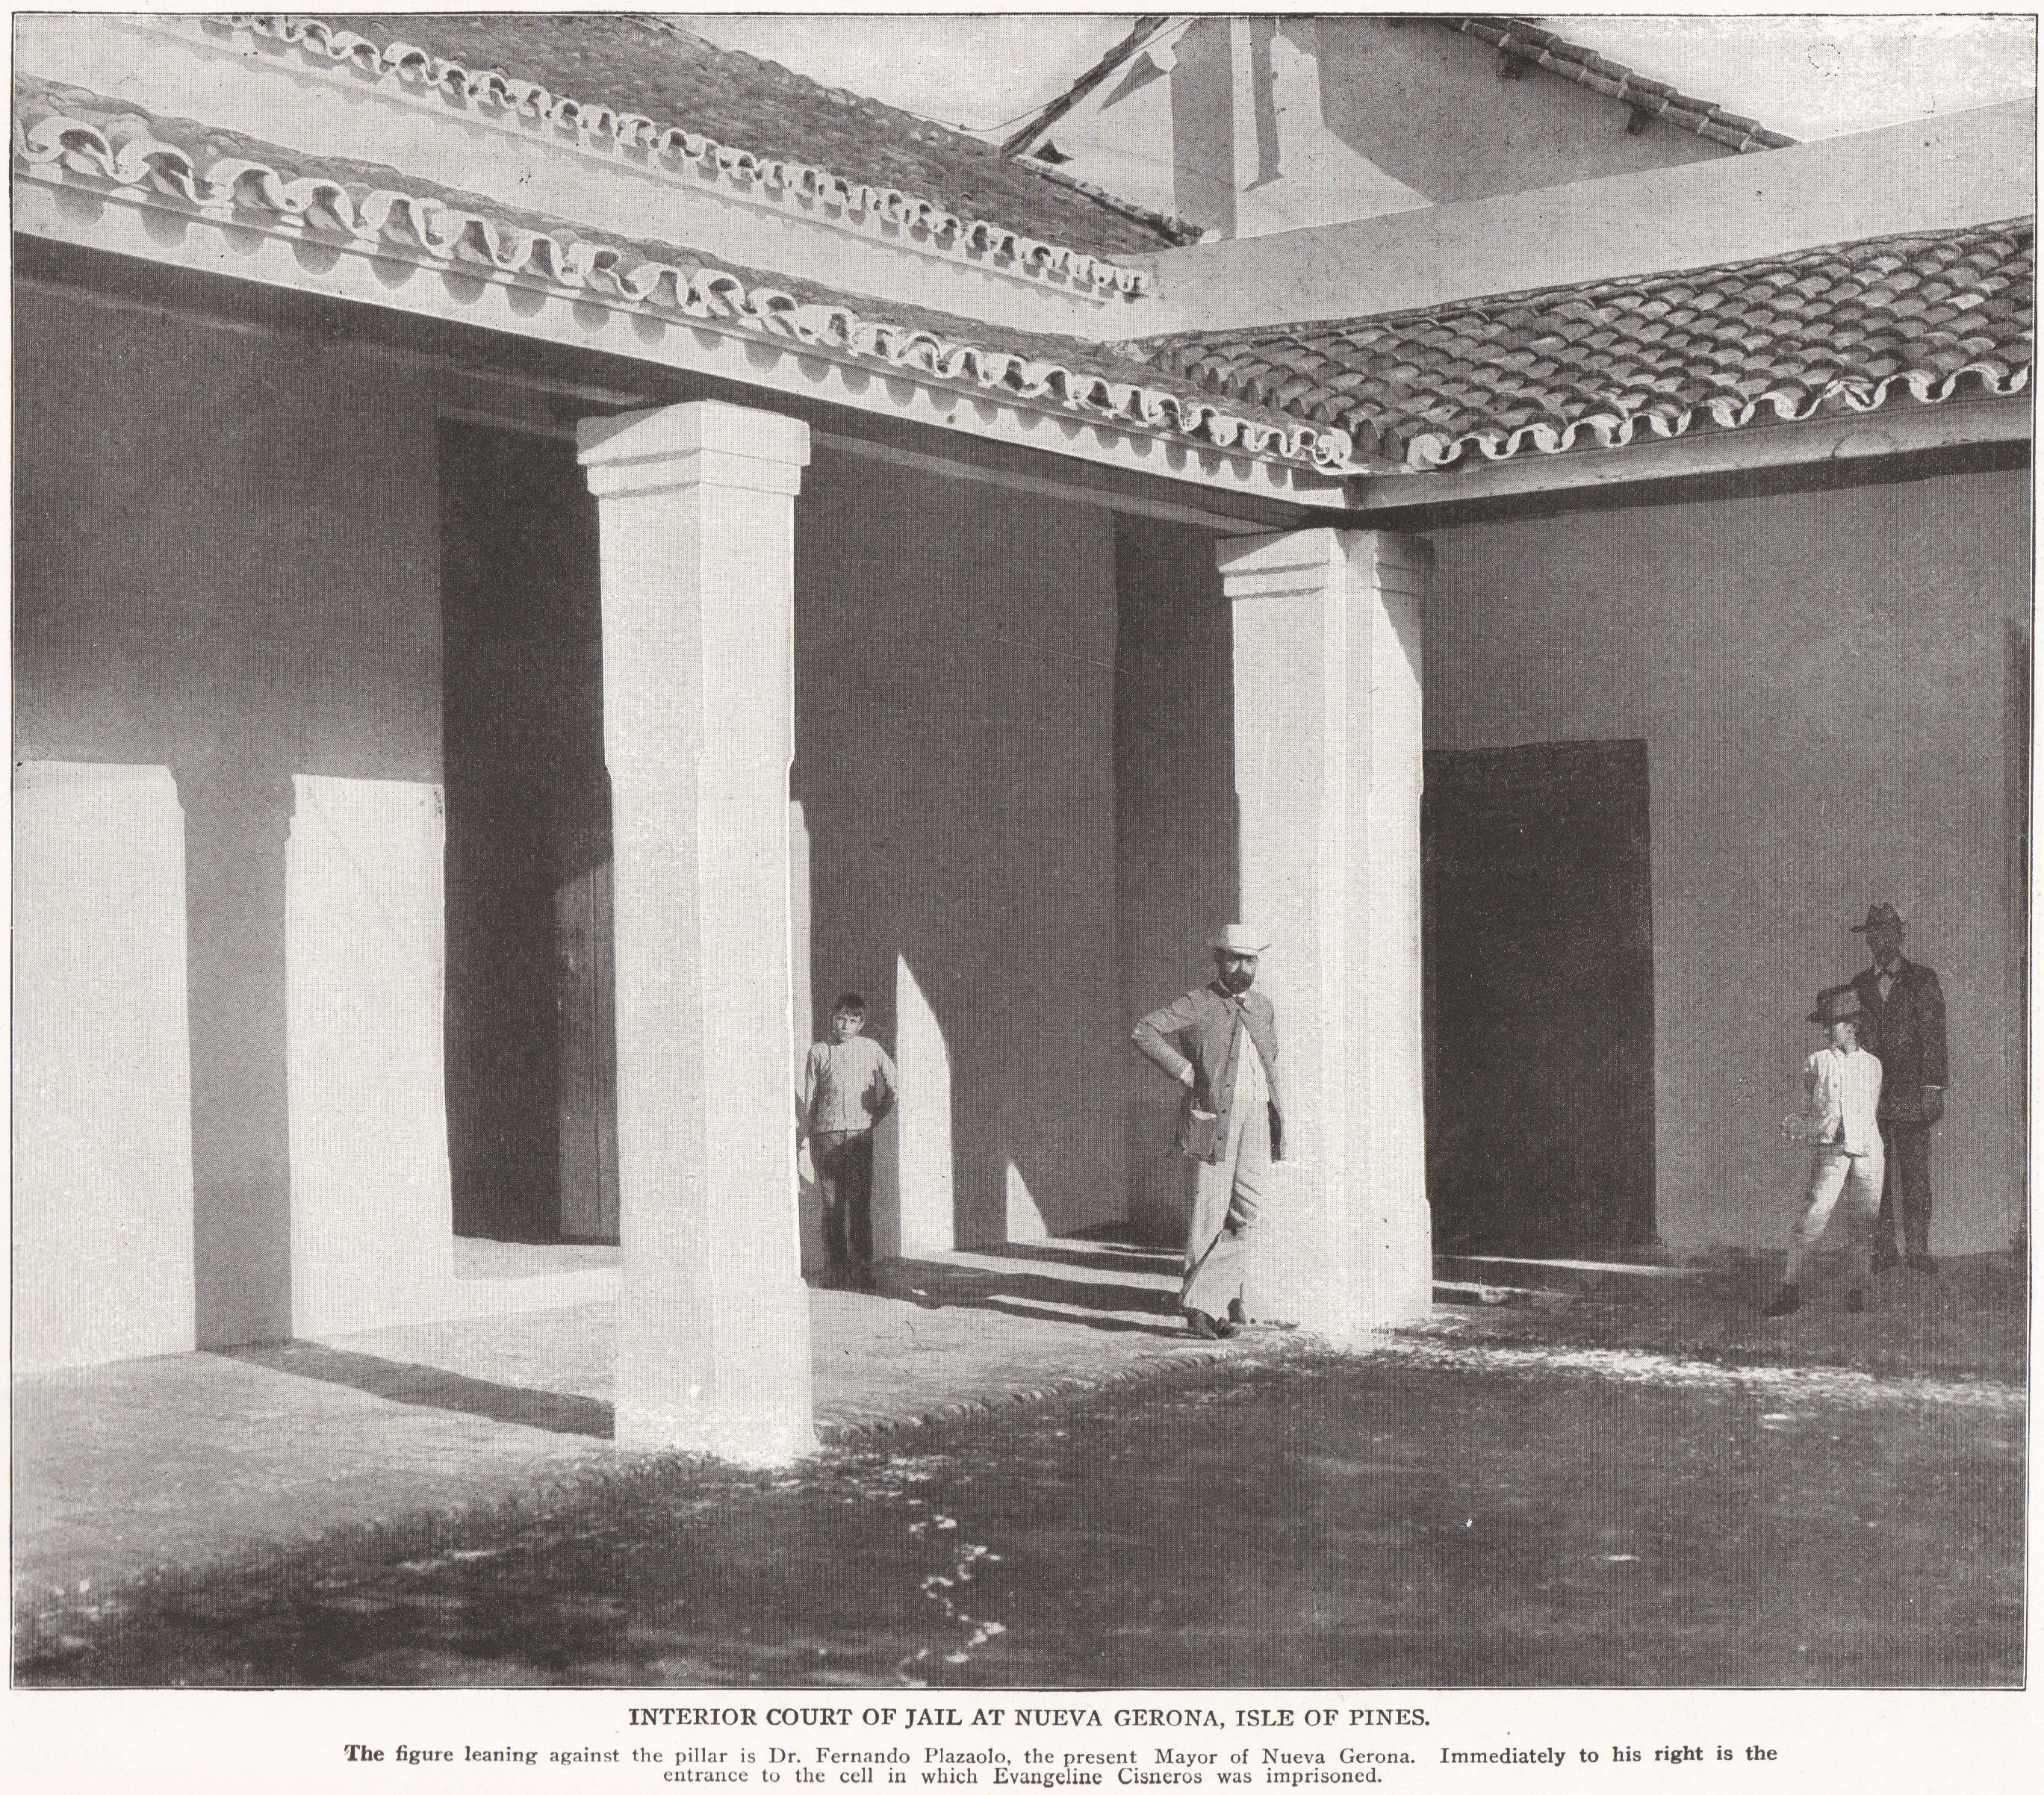 Interior Court of Jail at Nueva Gerona, Cuba (1898)